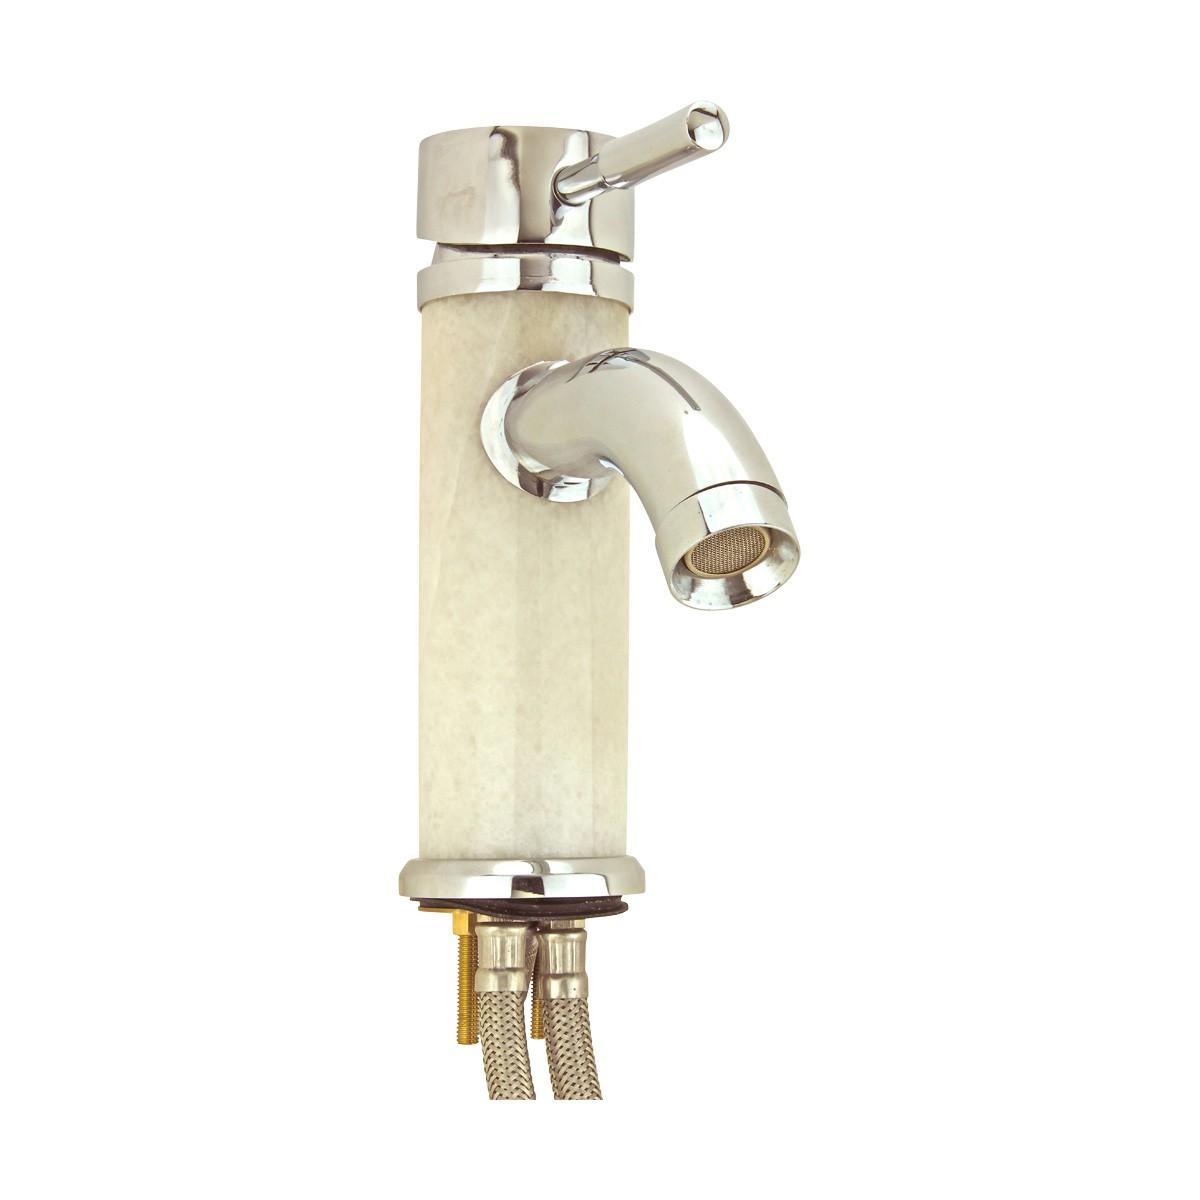 3 Bathroom White Marble Faucet Chrome Single Hole 1 Handle Faucets Bathroom Faucets Single Hole Faucets